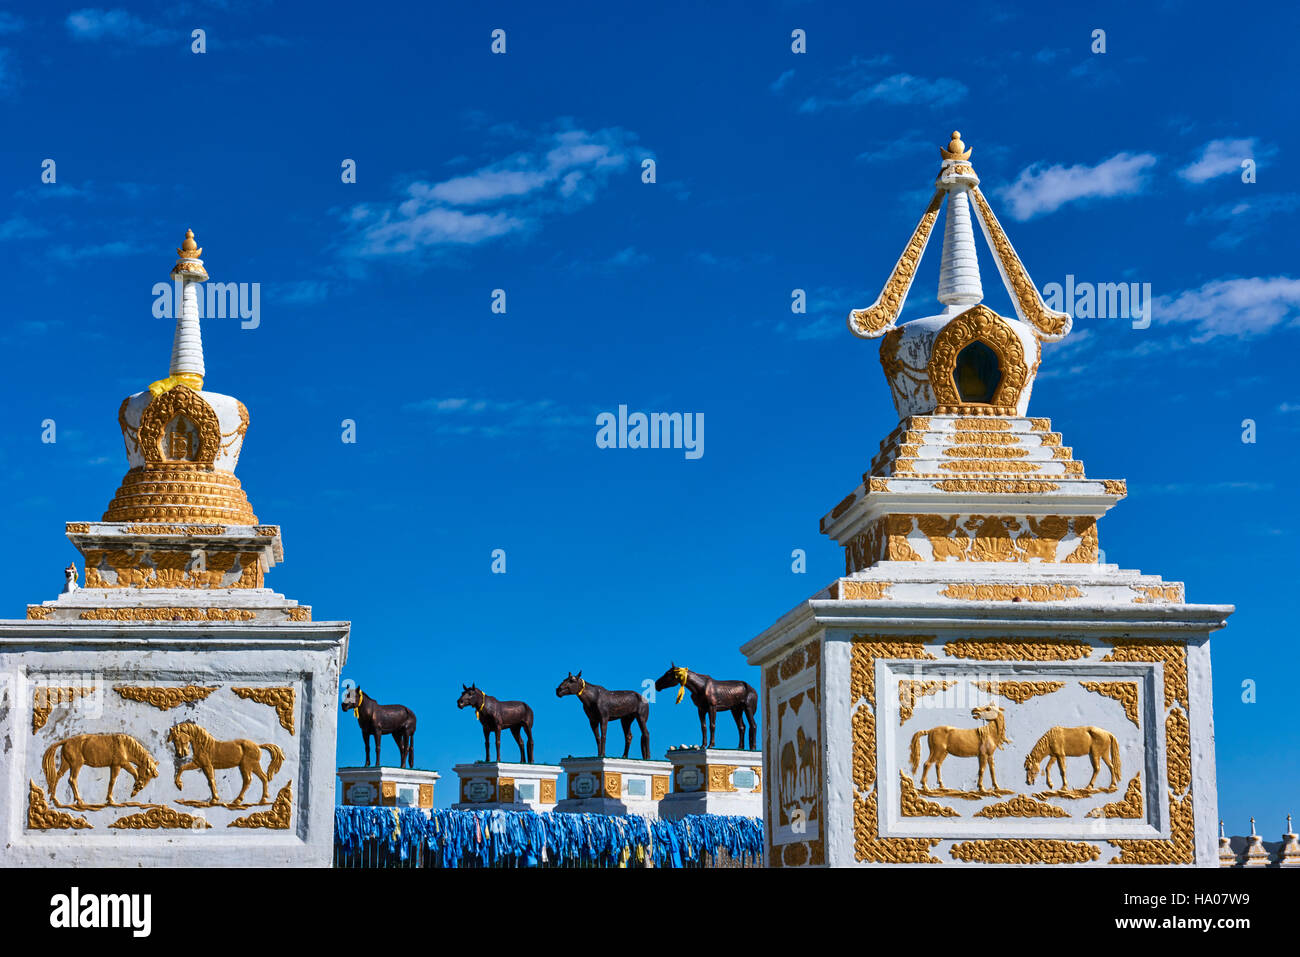 Mongolia, Bayankhongor province, monument in honour of Mongolian horses - Stock Image